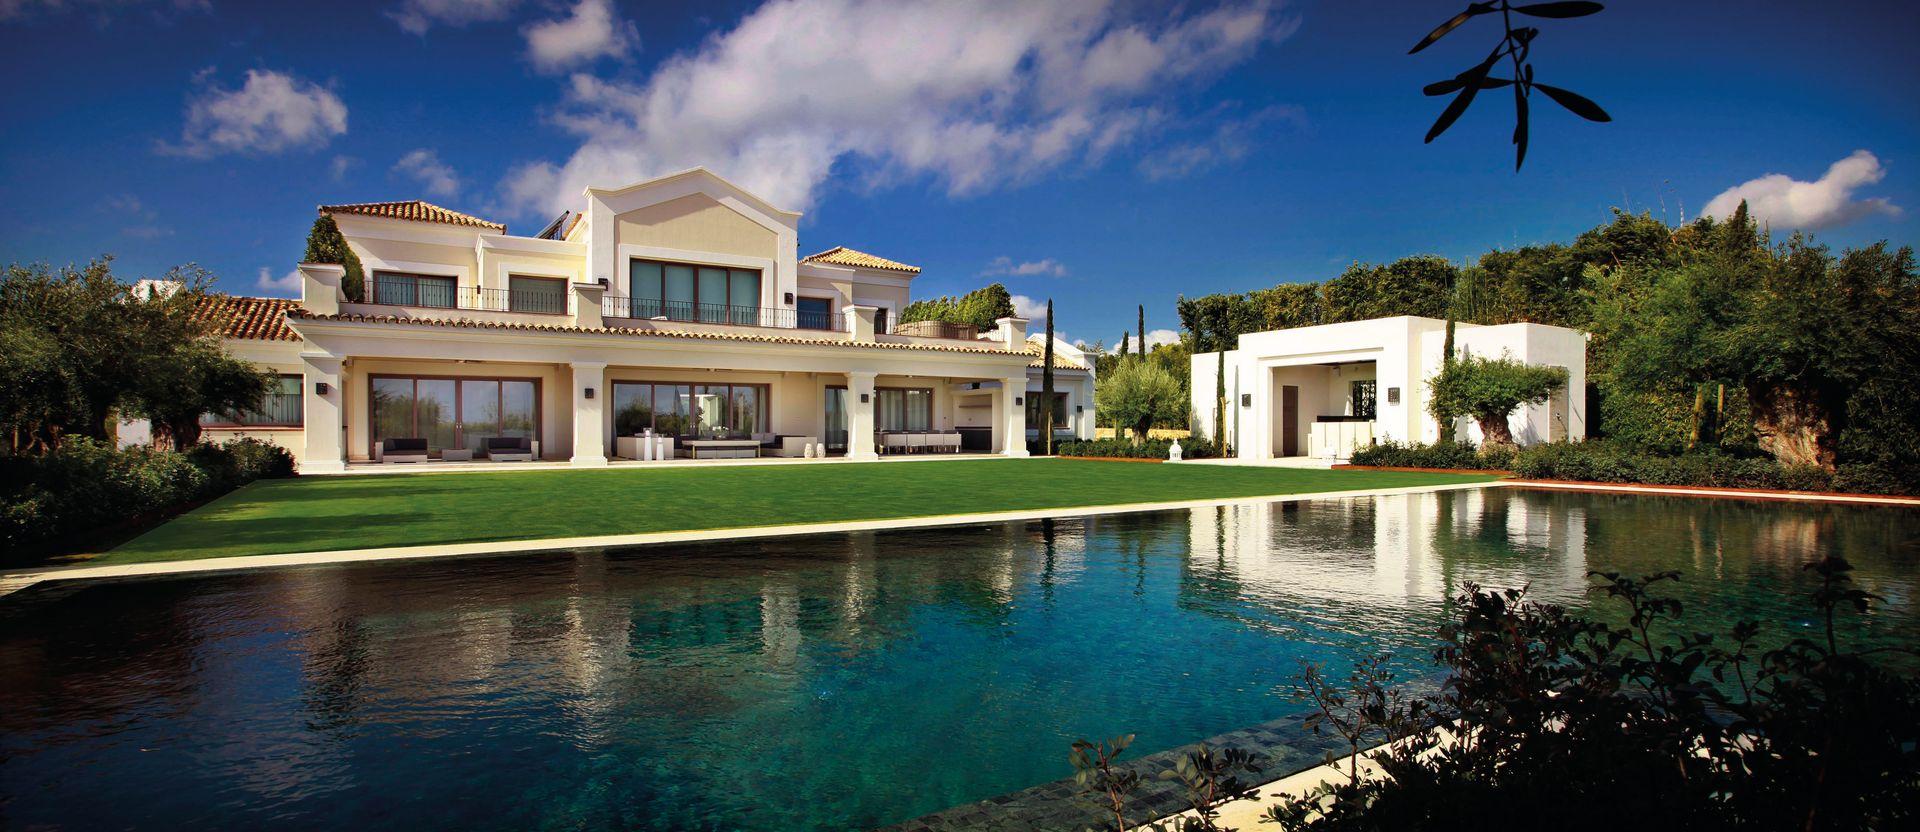 Six-Bedroom Luxury Villa With Private Spa in Sotogrande